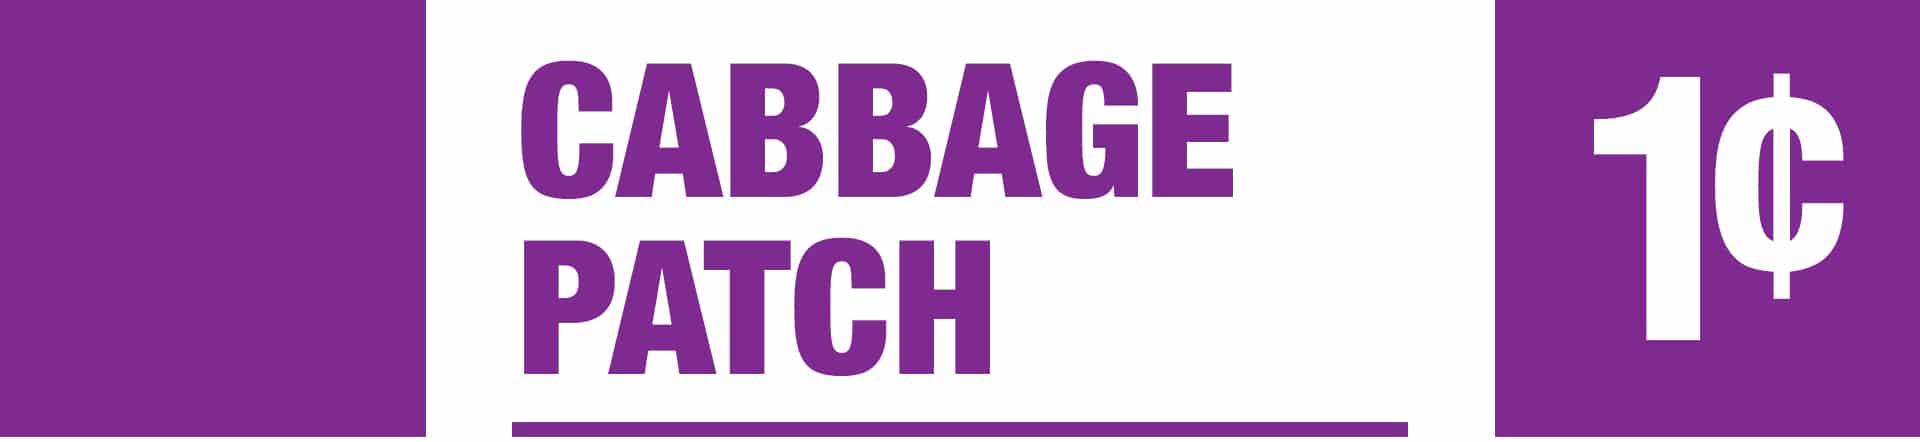 Cabbage Patch - Penny Jackpot